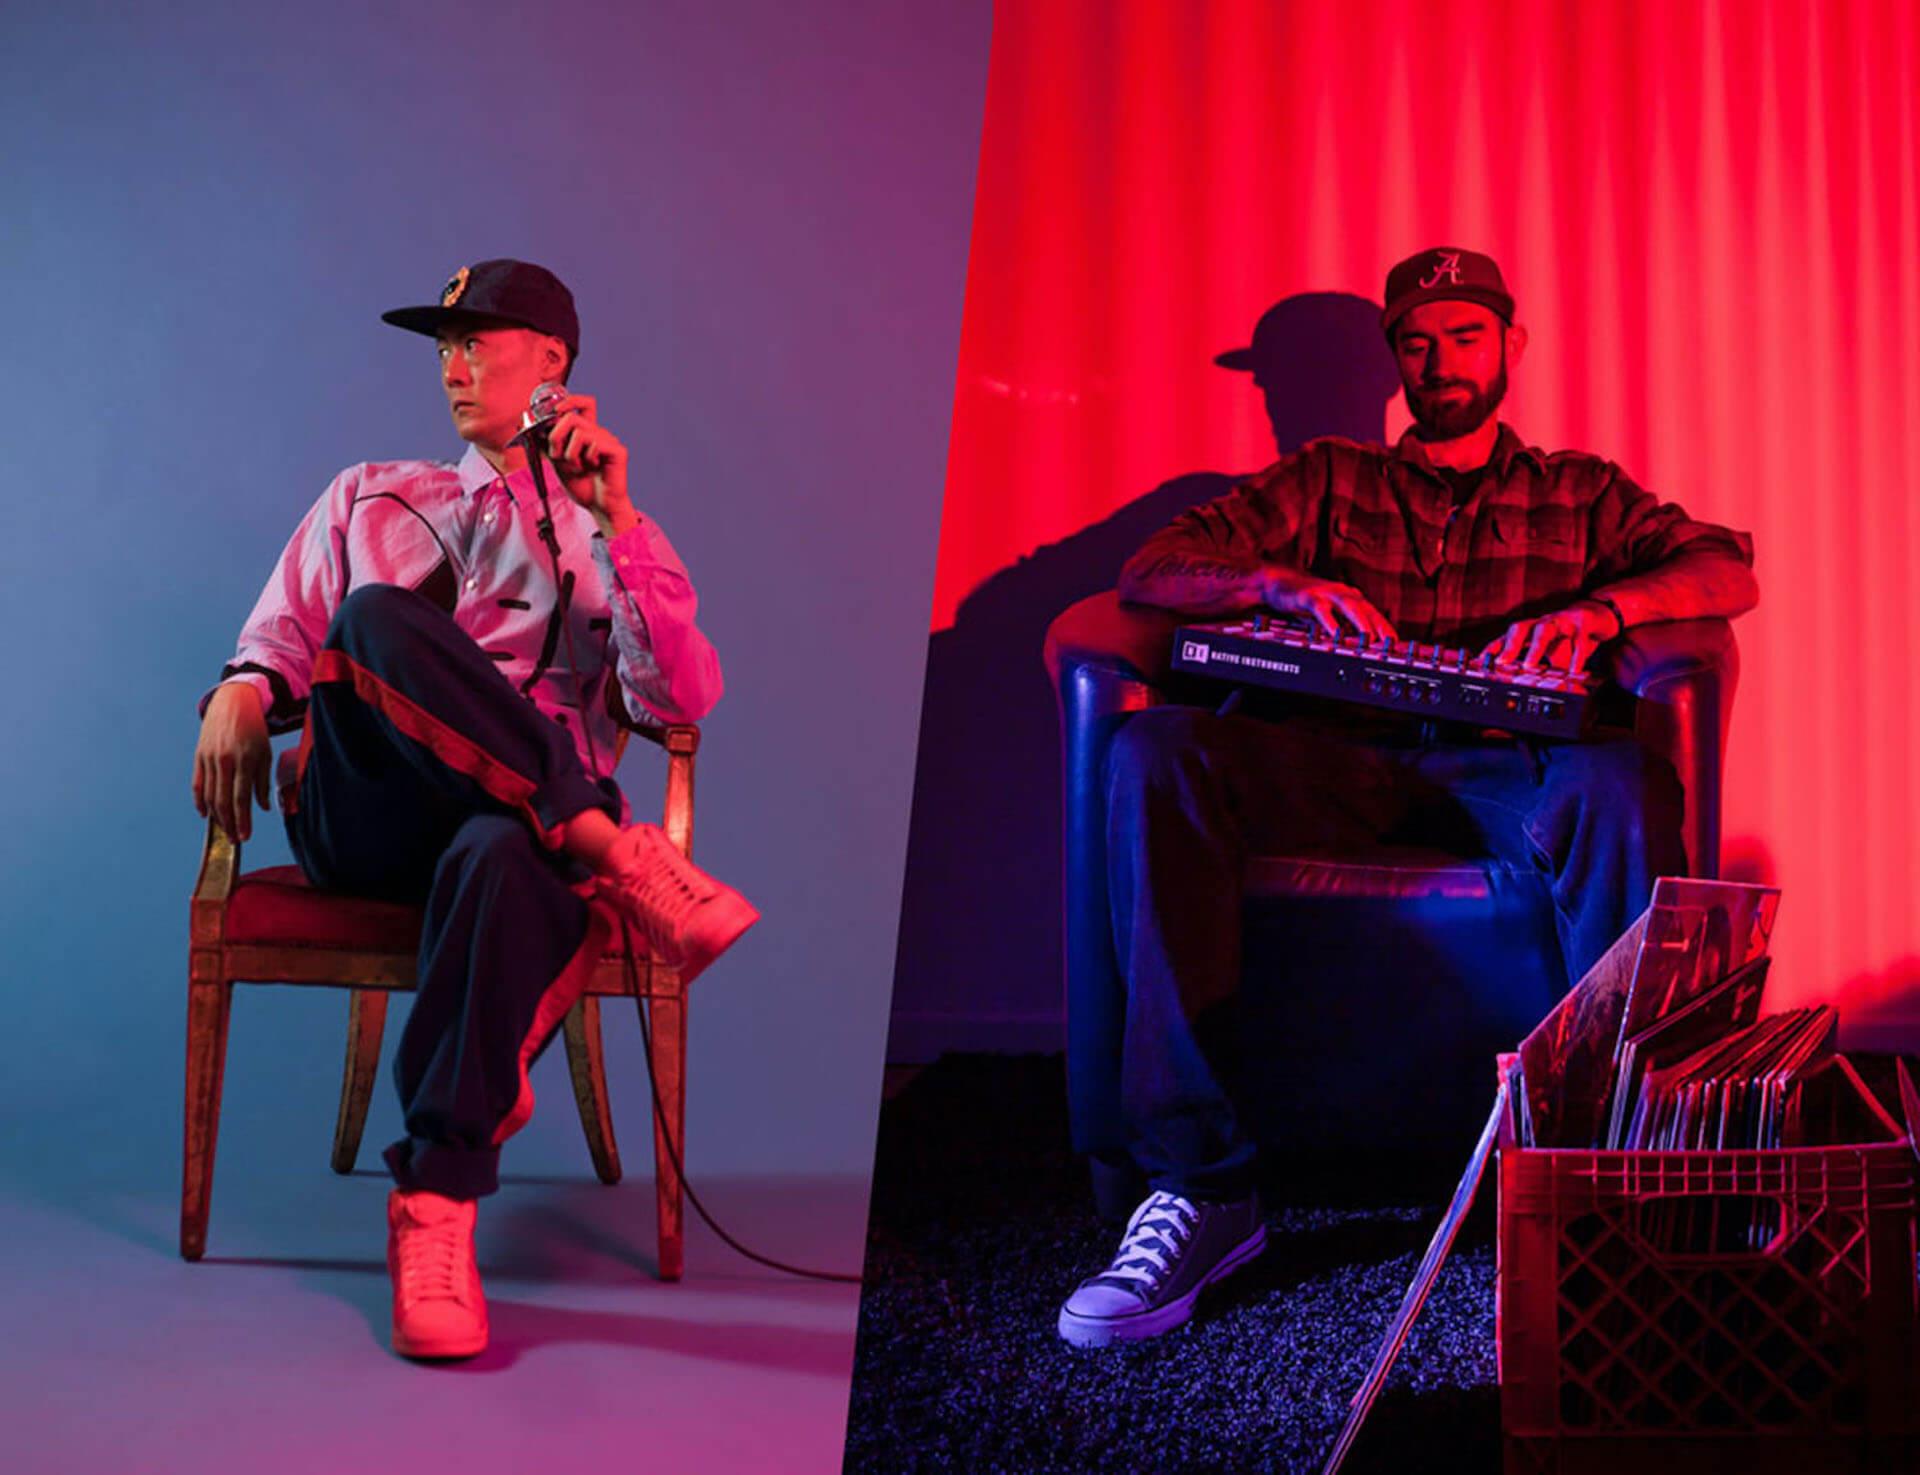 Shing02とJack The Ripがタッグを組んだヒップホップ・アルバム『Triumphant』が待望のフィジカル化! music201204_shing02-main